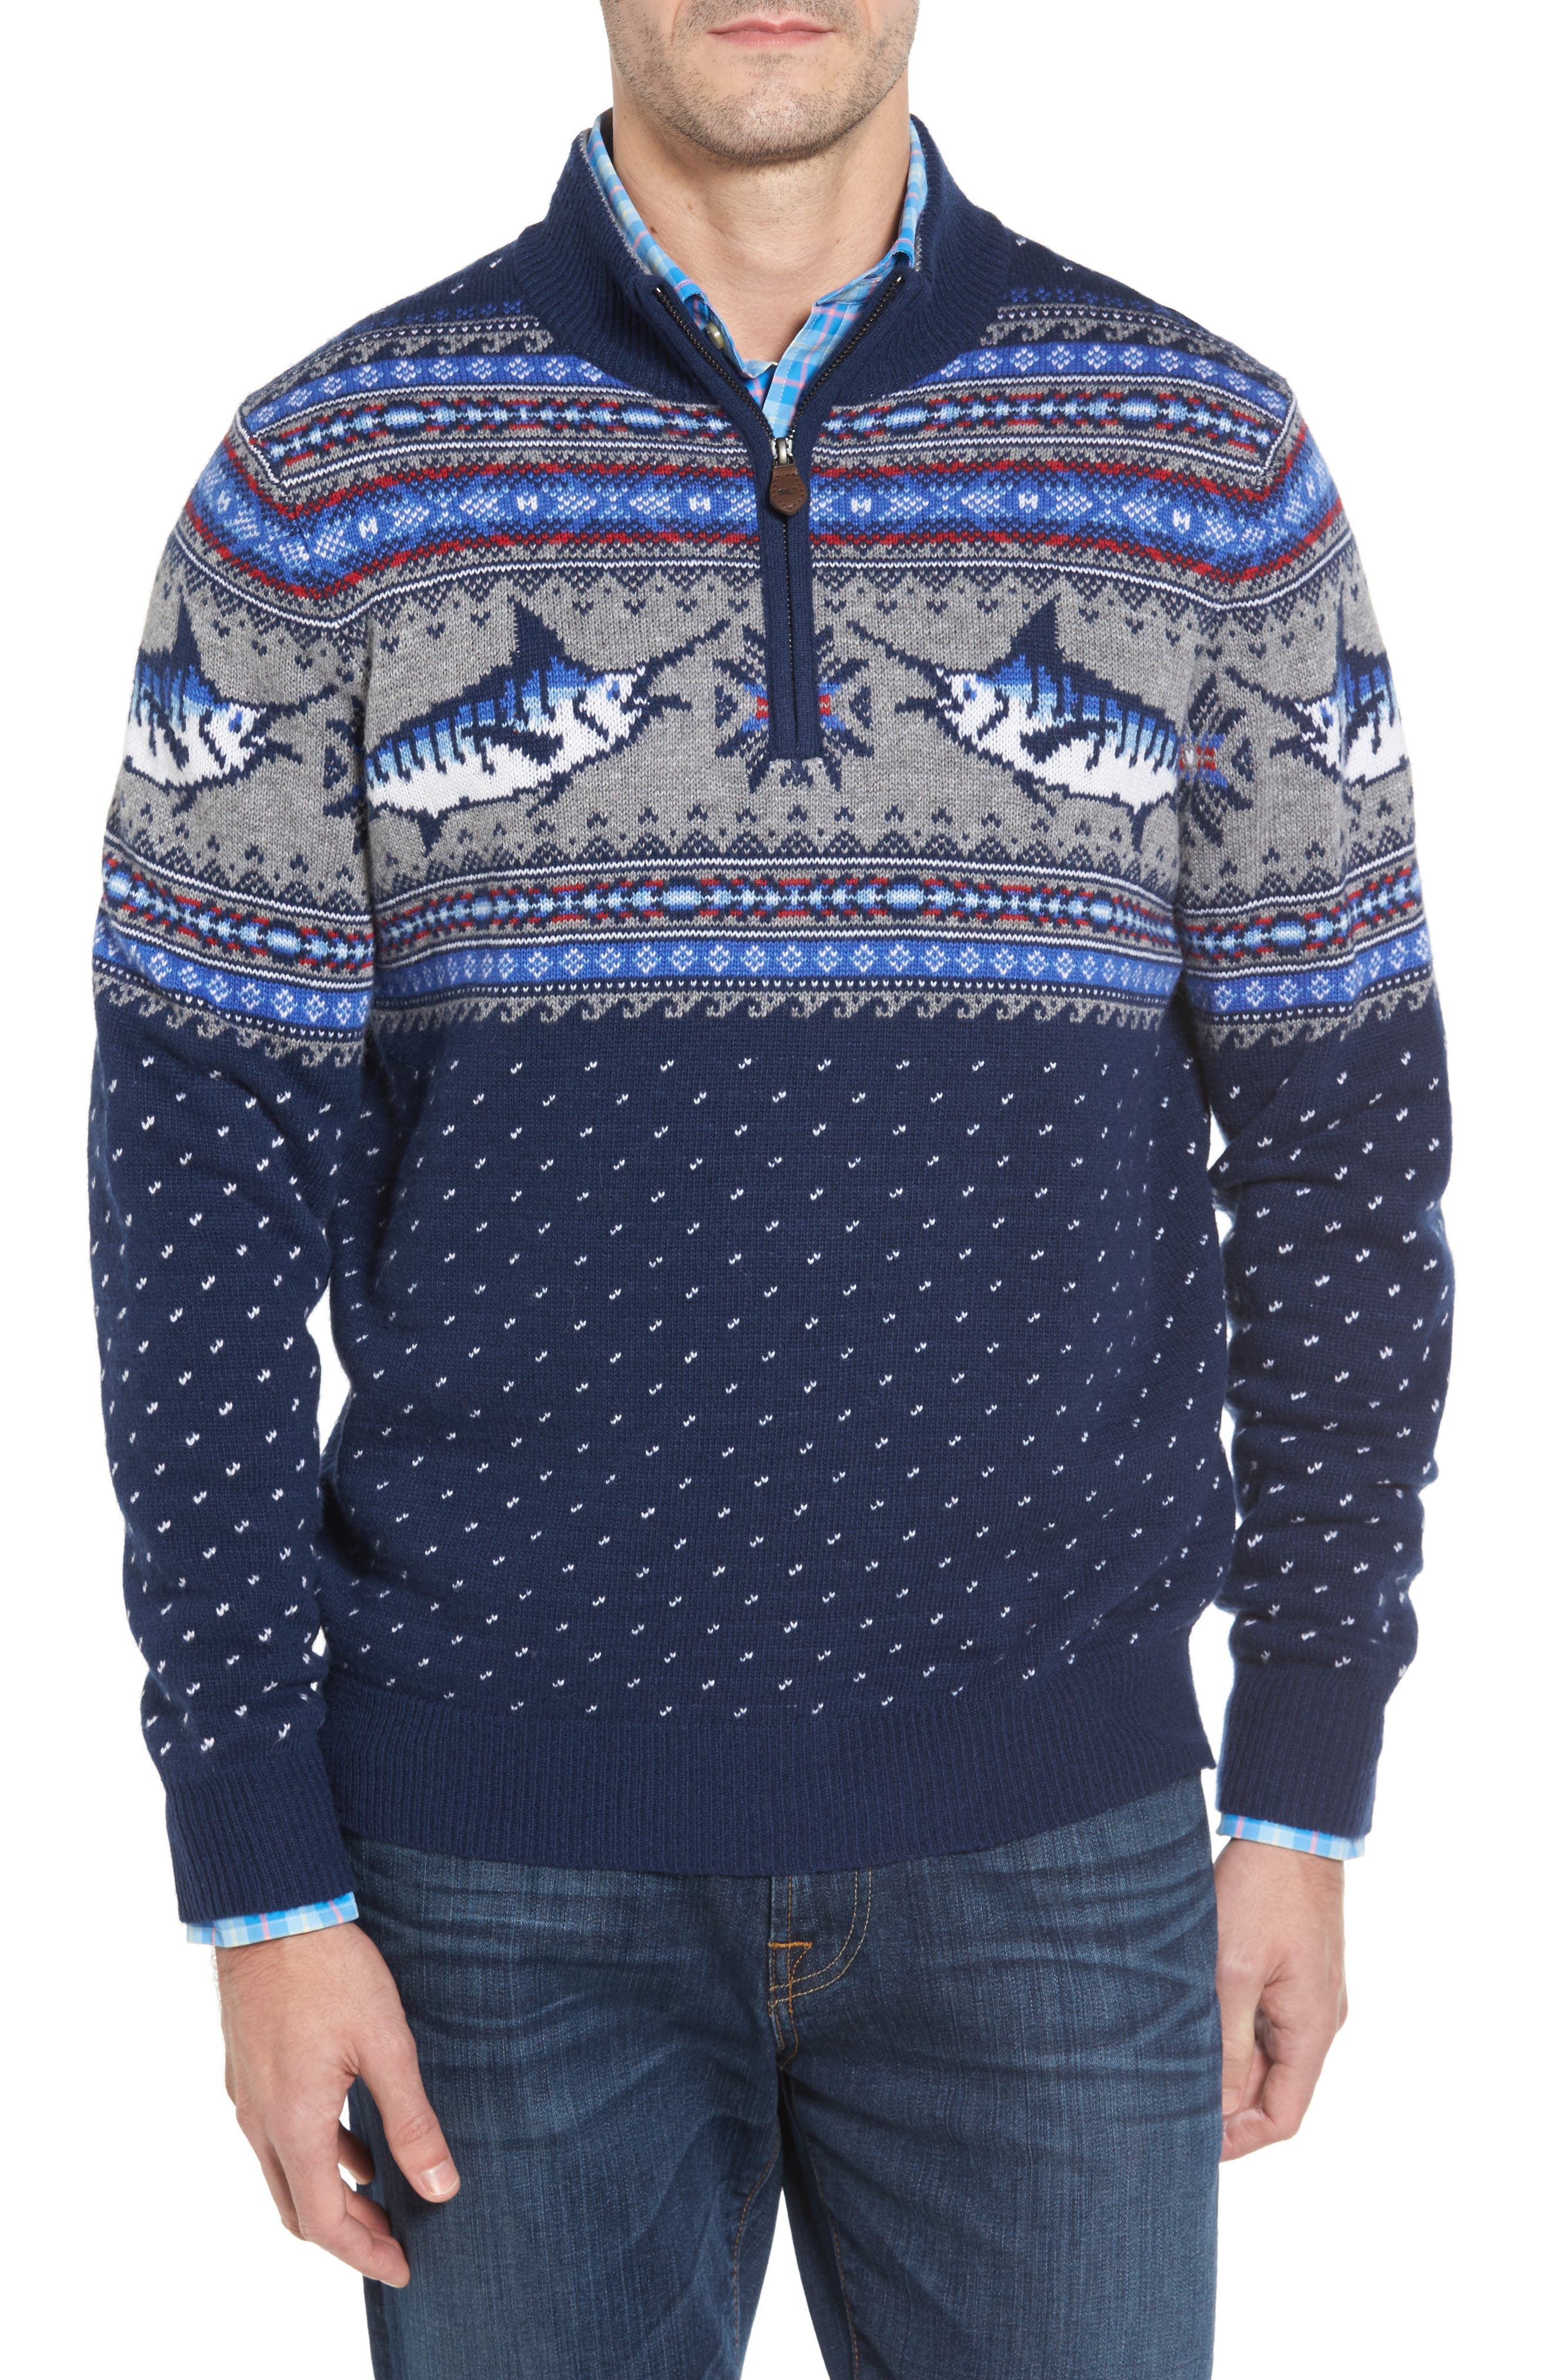 Marlin Fair Isle Quarter Zip Sweater,                             Main thumbnail 1, color,                             400